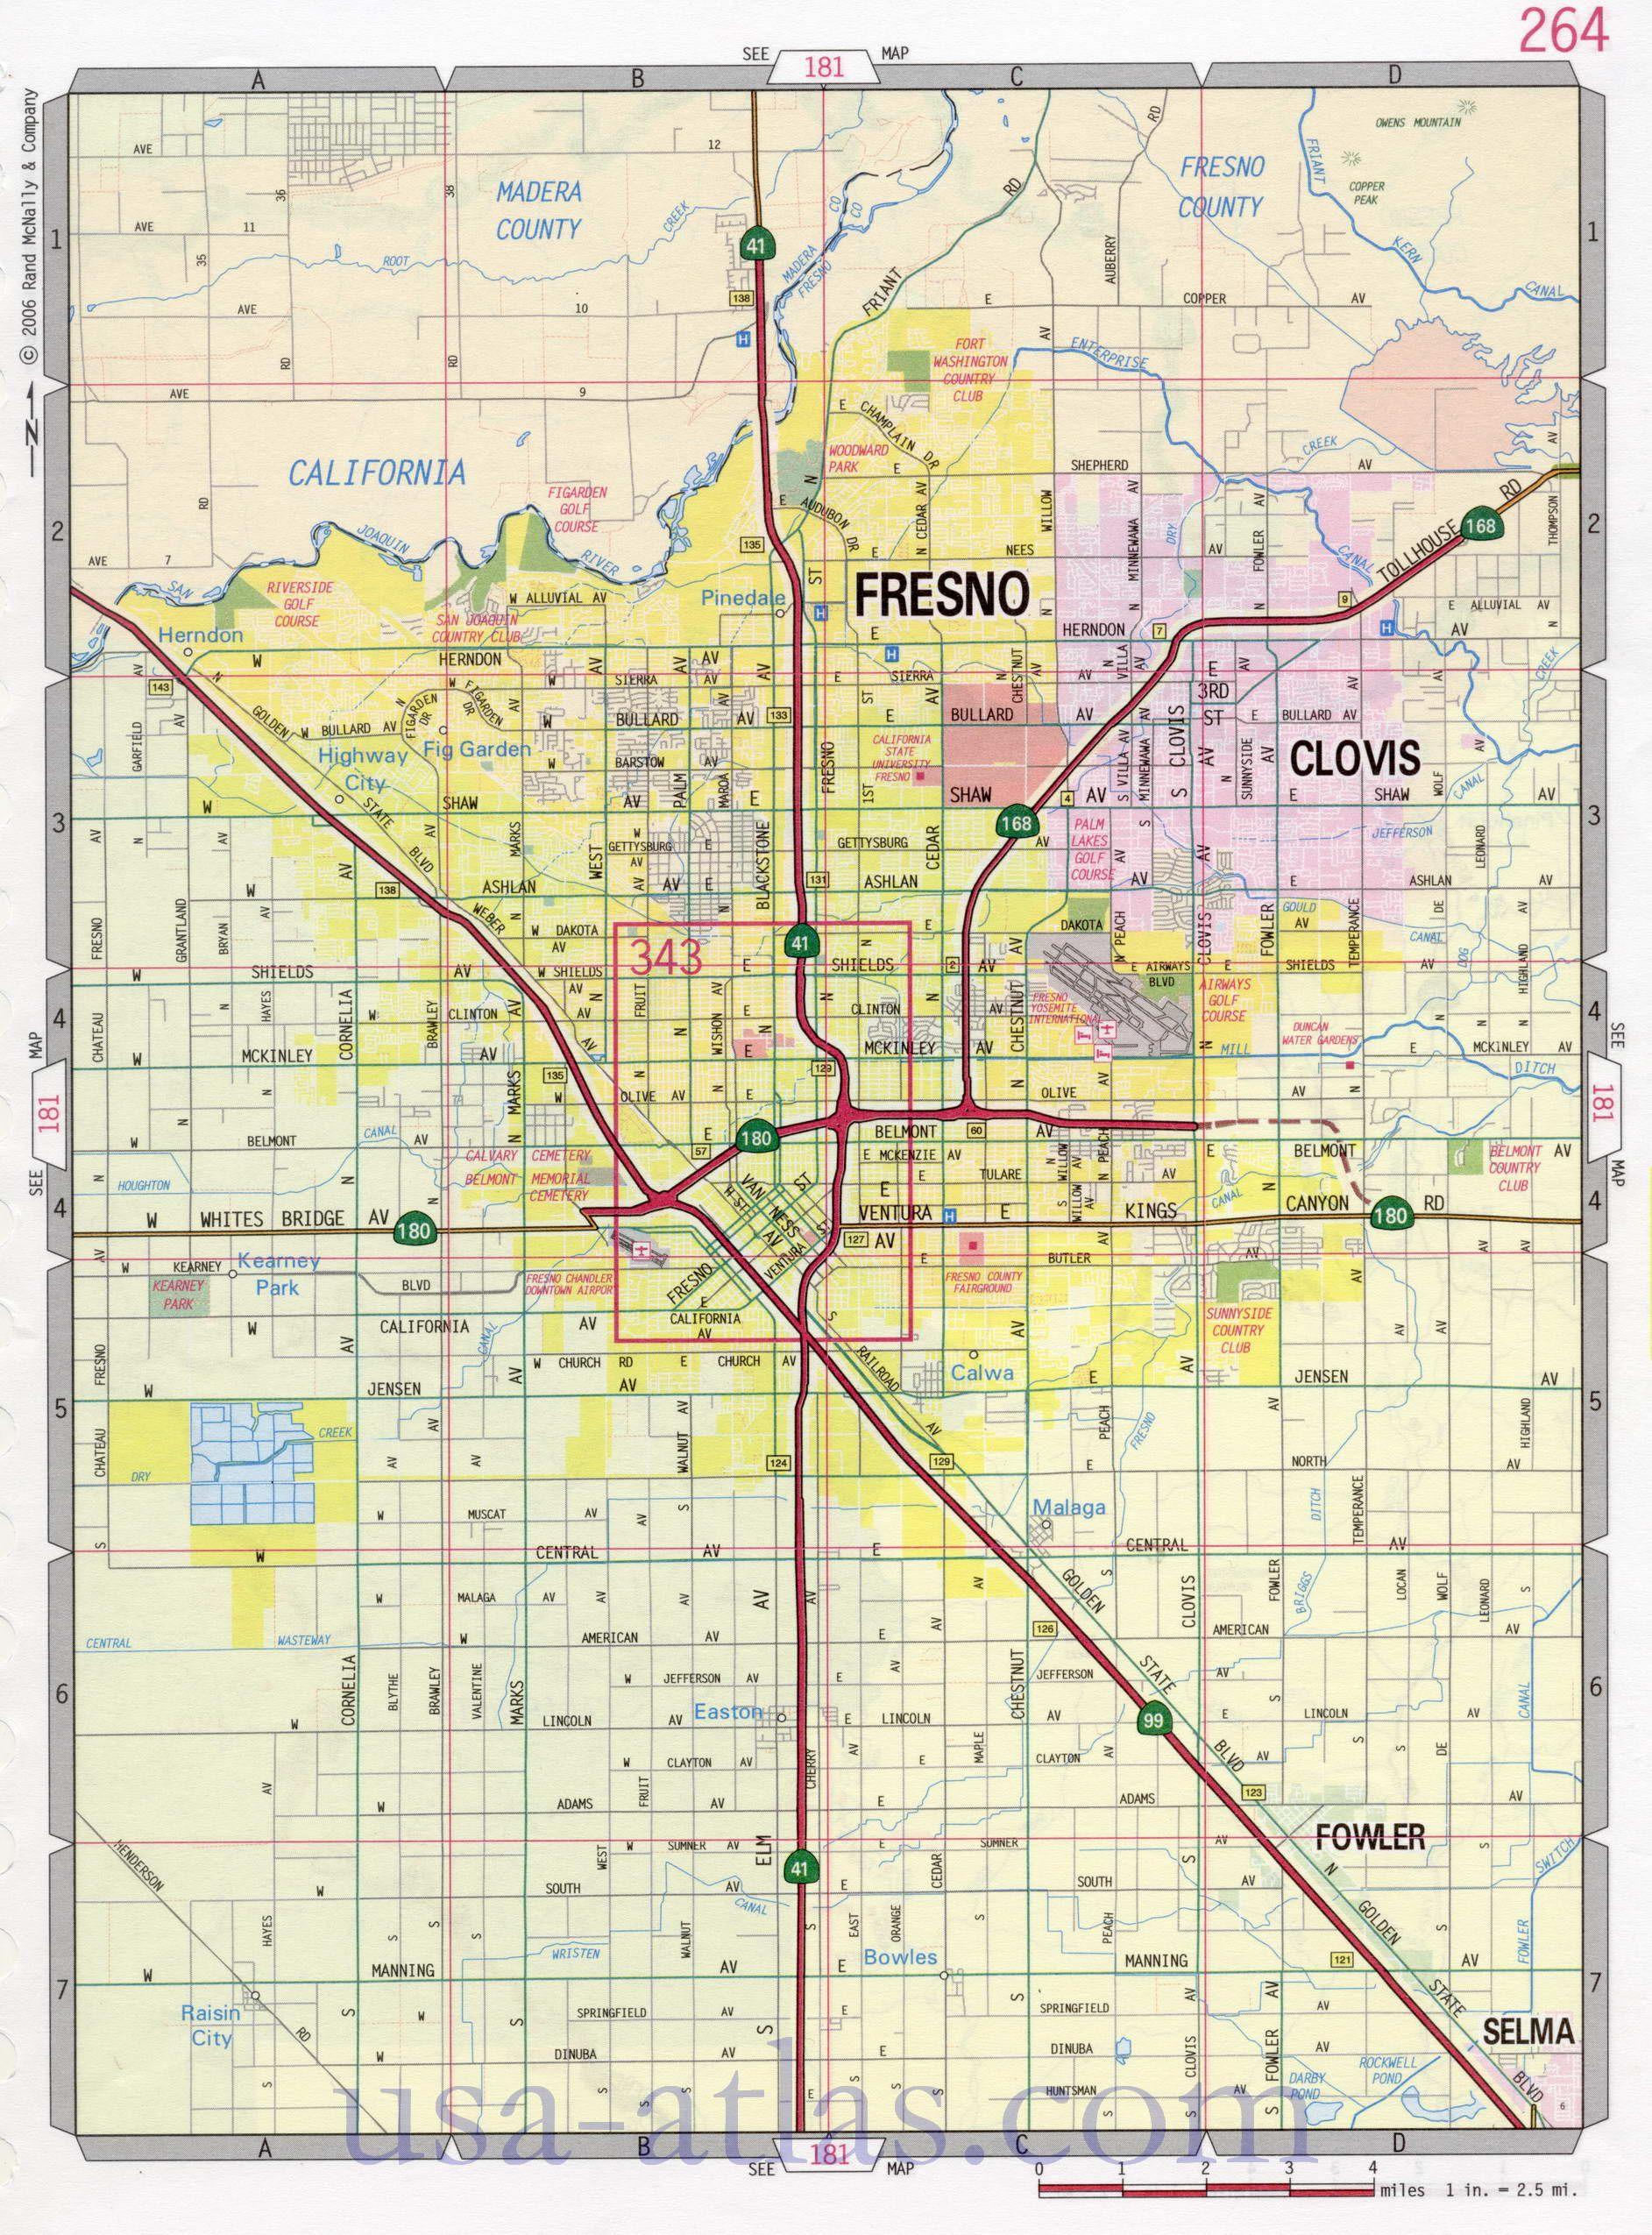 Fresno Street Map. Large-Scale Detailed Streets Map Fresno Sity - Fresno California Map